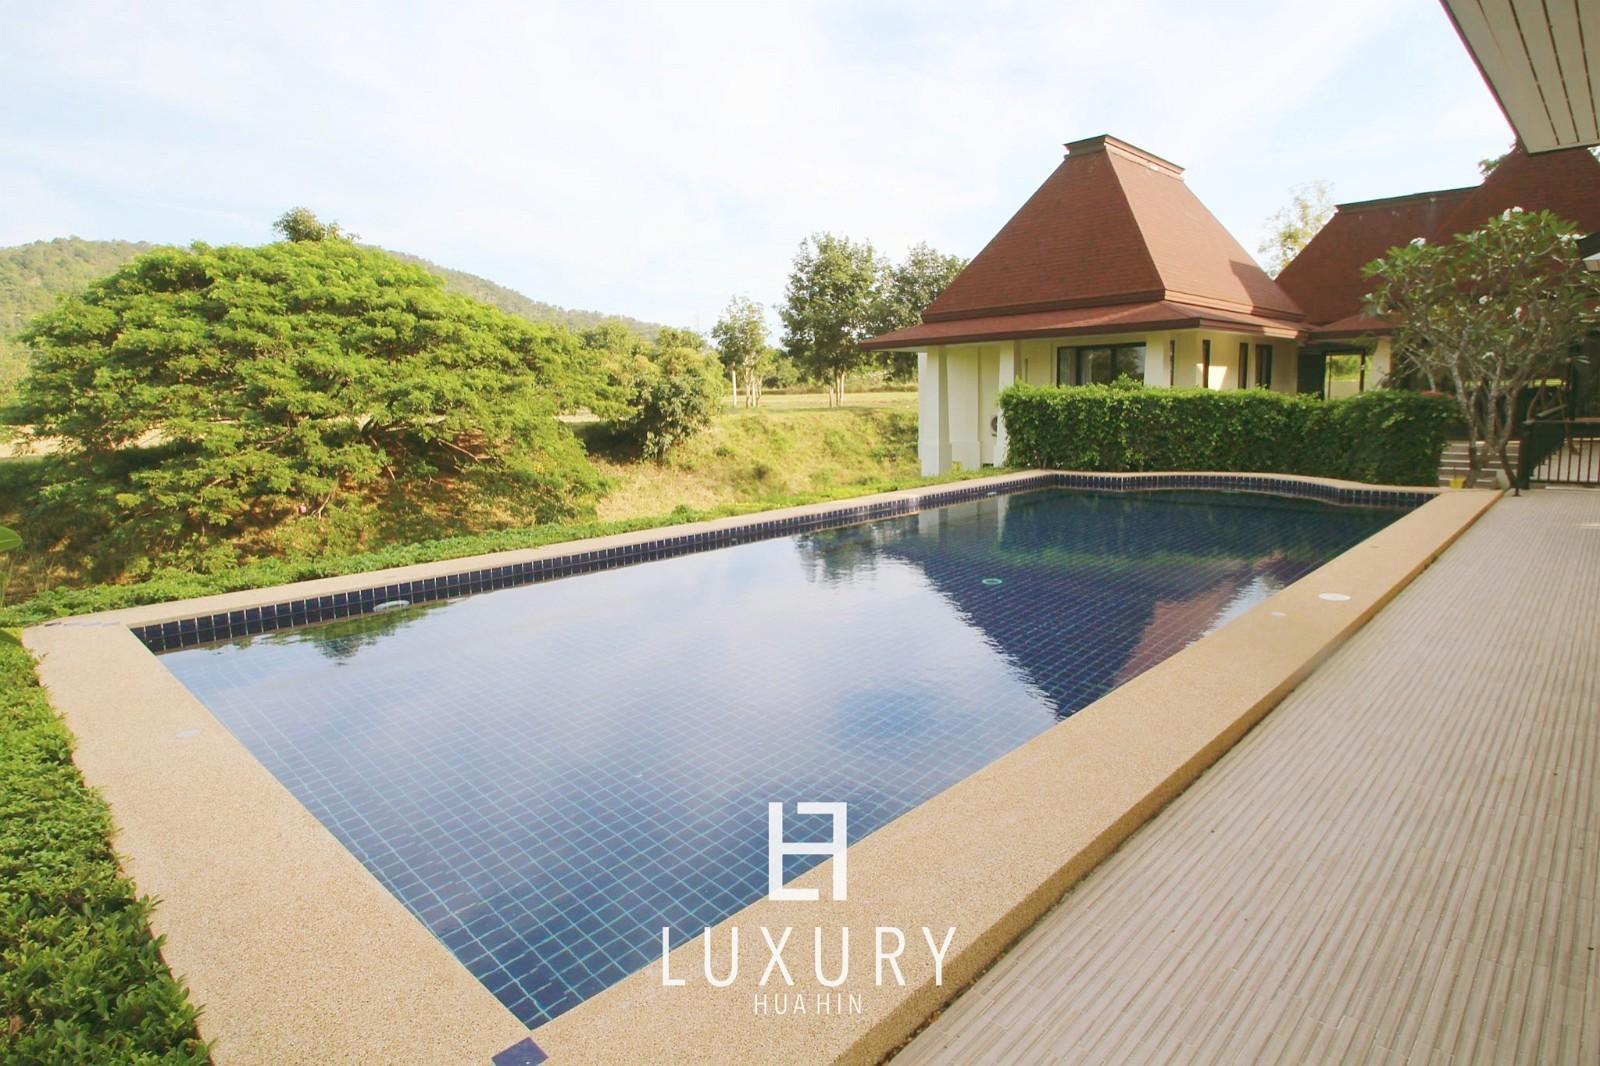 Bali style 7 bedrooms Pool villa Palm Hills PH202